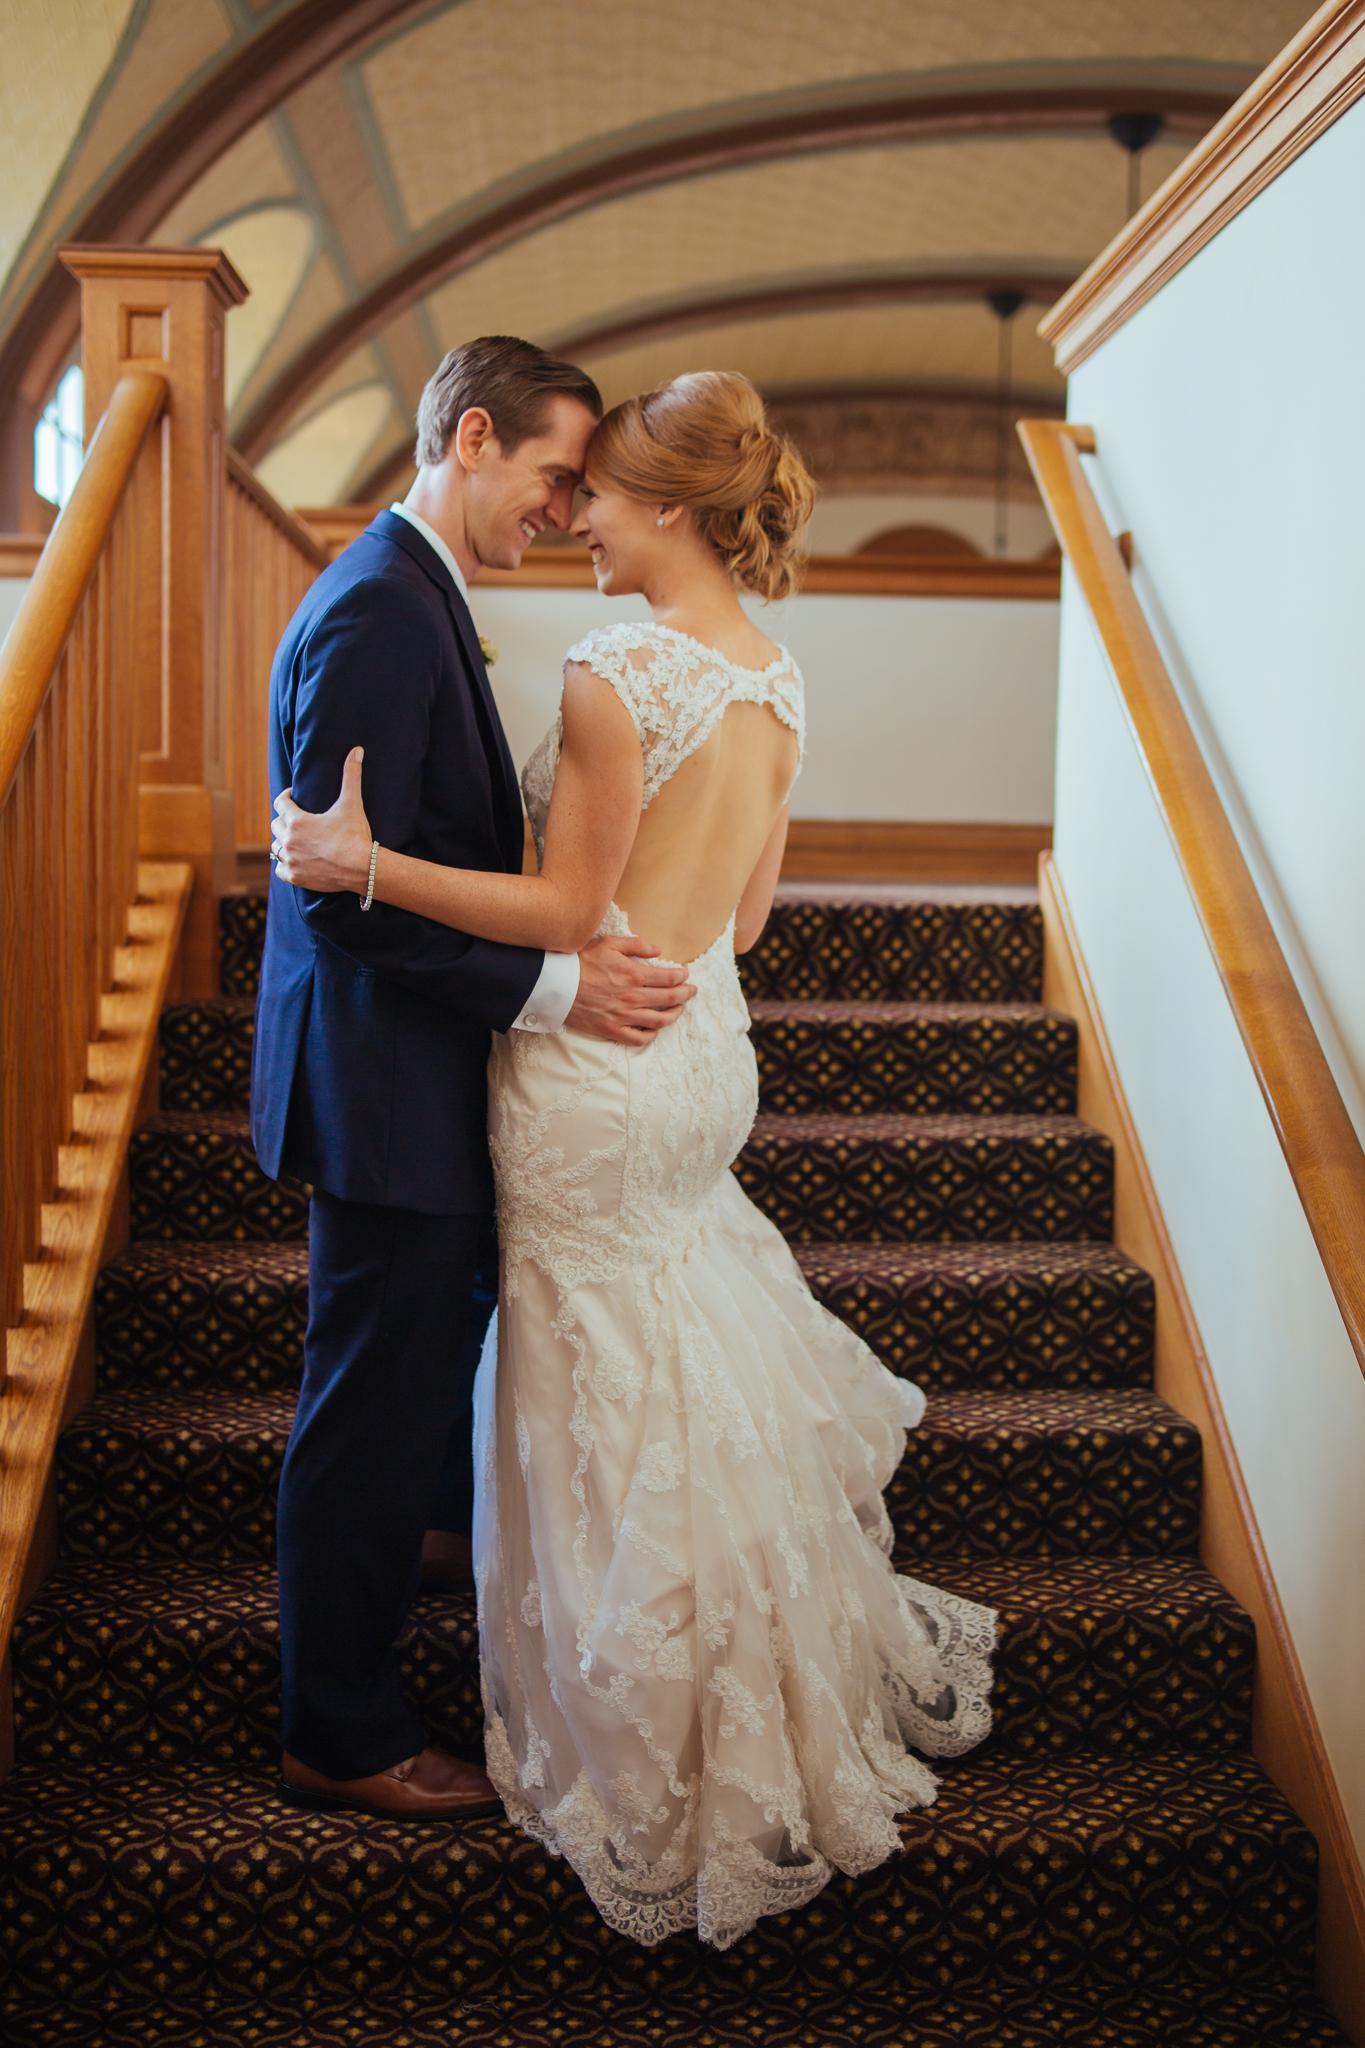 Michael and Kelly - the ashton depot - wedding DFW - wedding photographer- elizalde photography (73 of 150).jpg